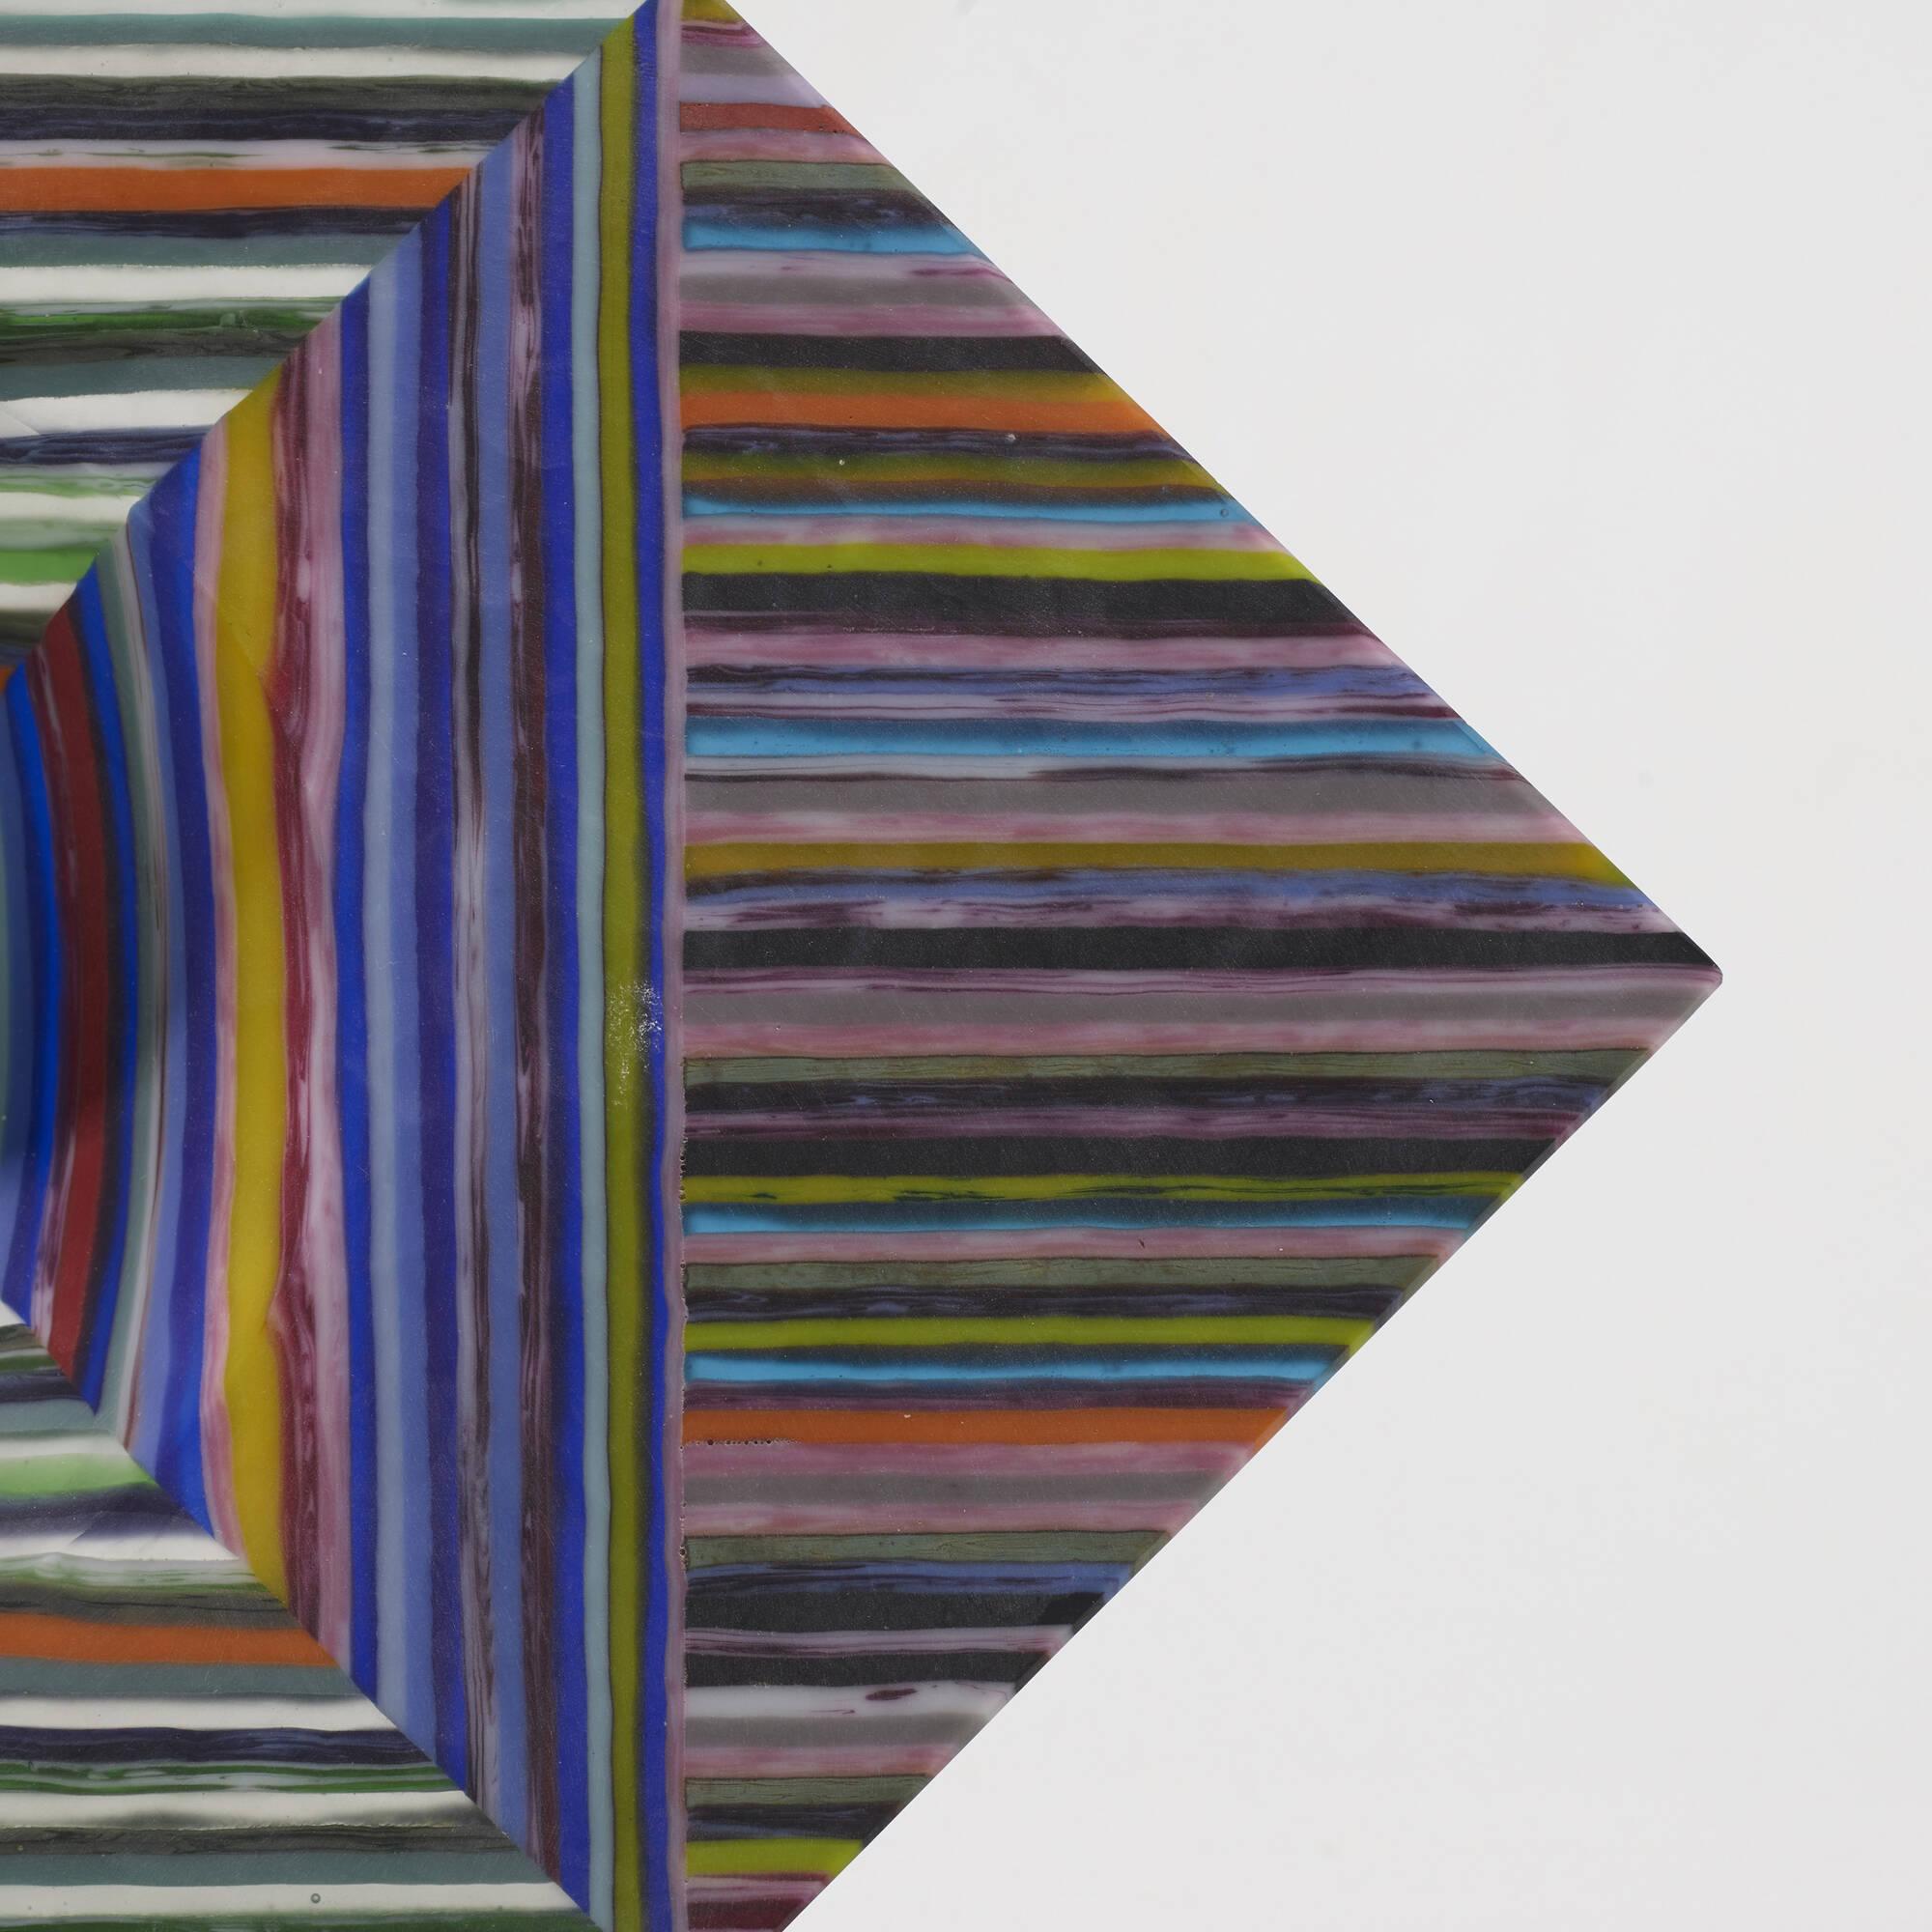 144: Klaus Moje / Schale No. 29 (2 of 3)